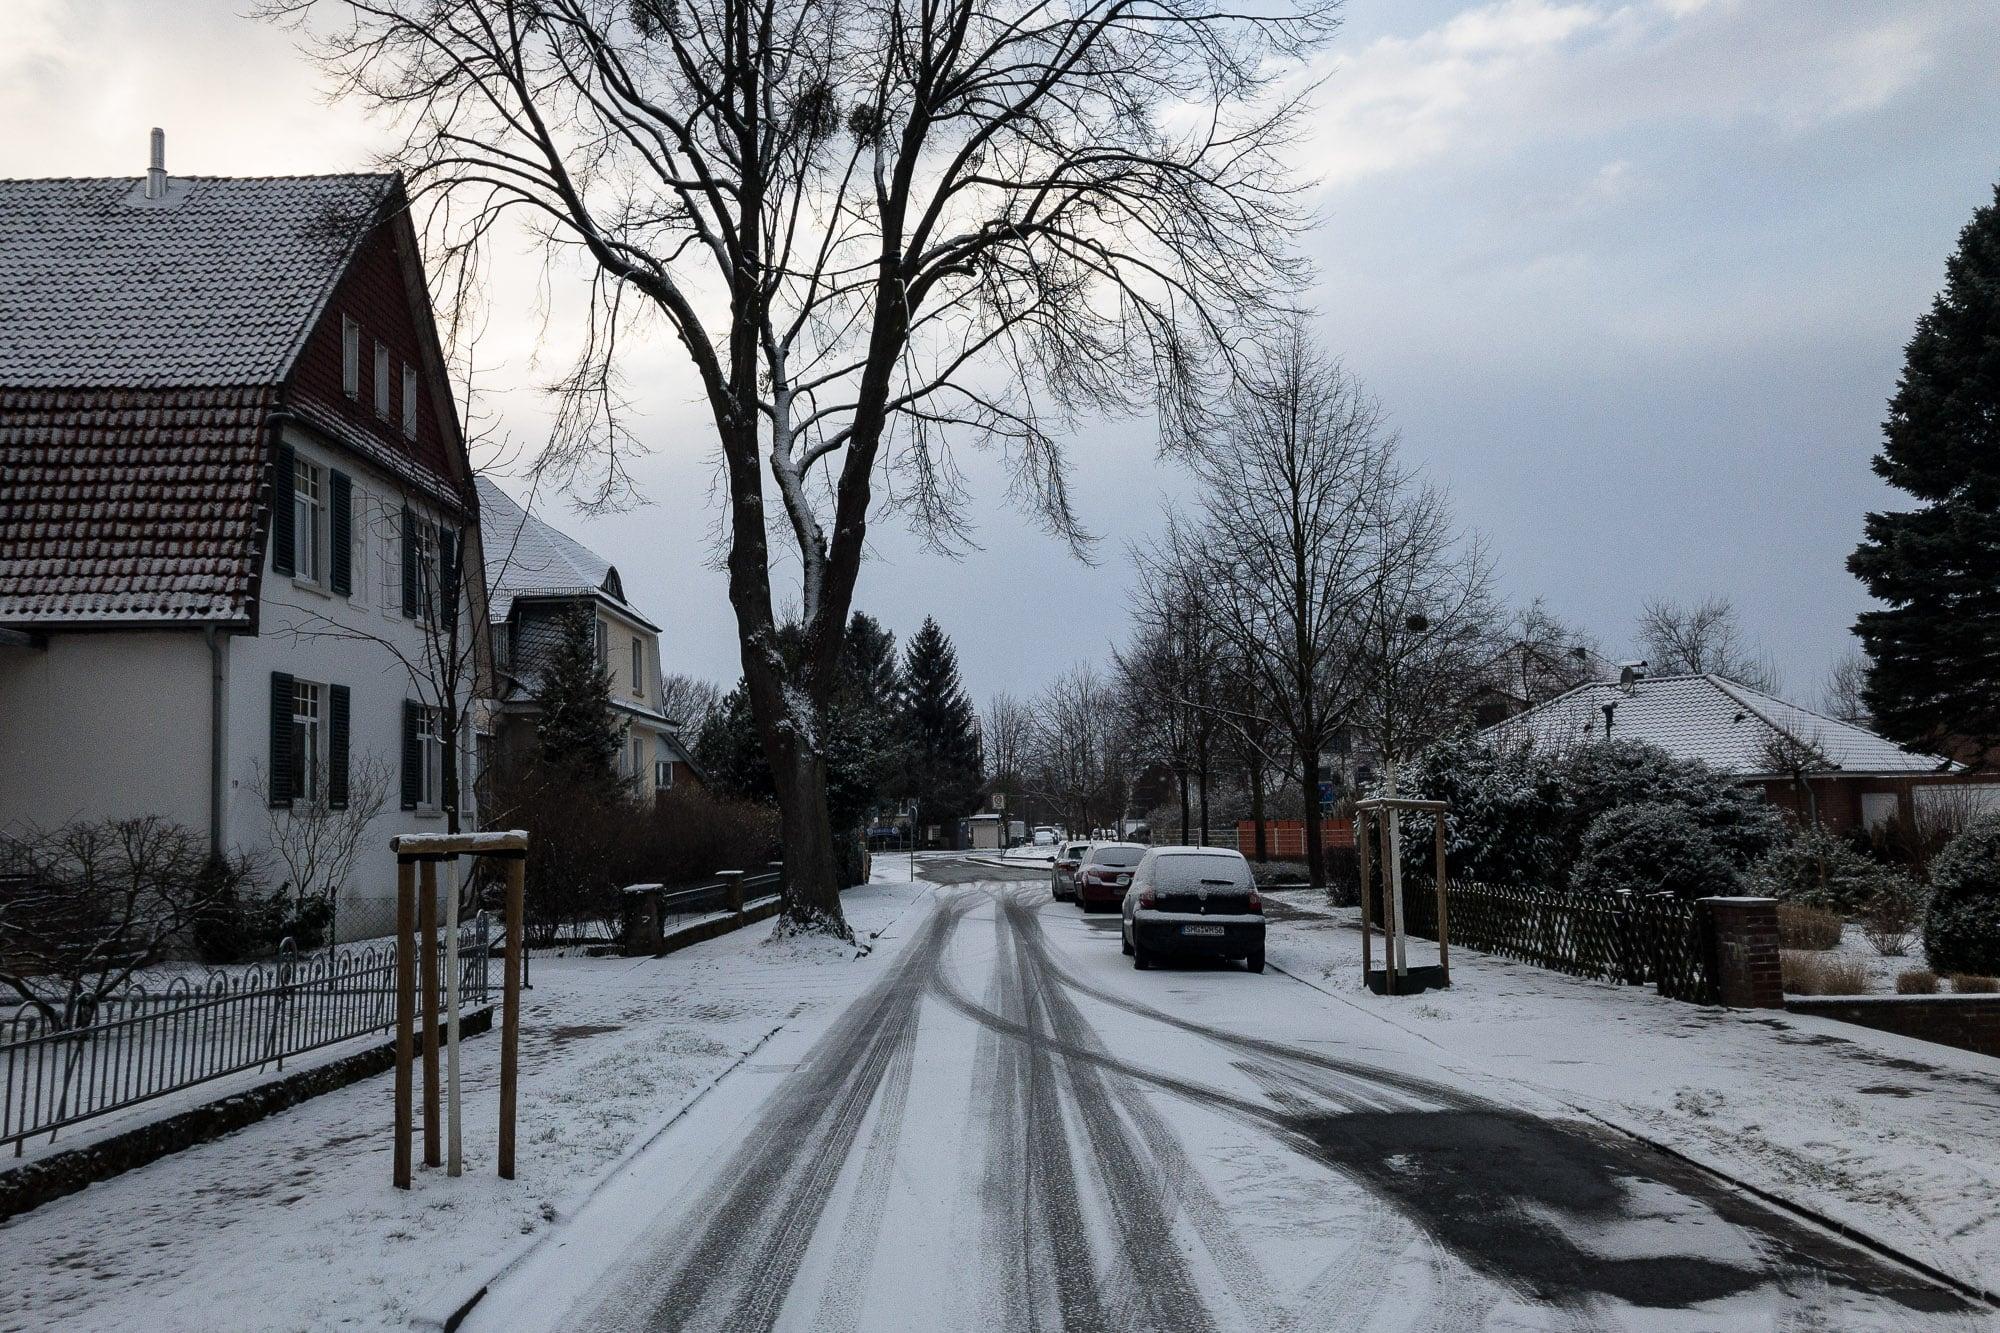 snow in Bad Nenndorf